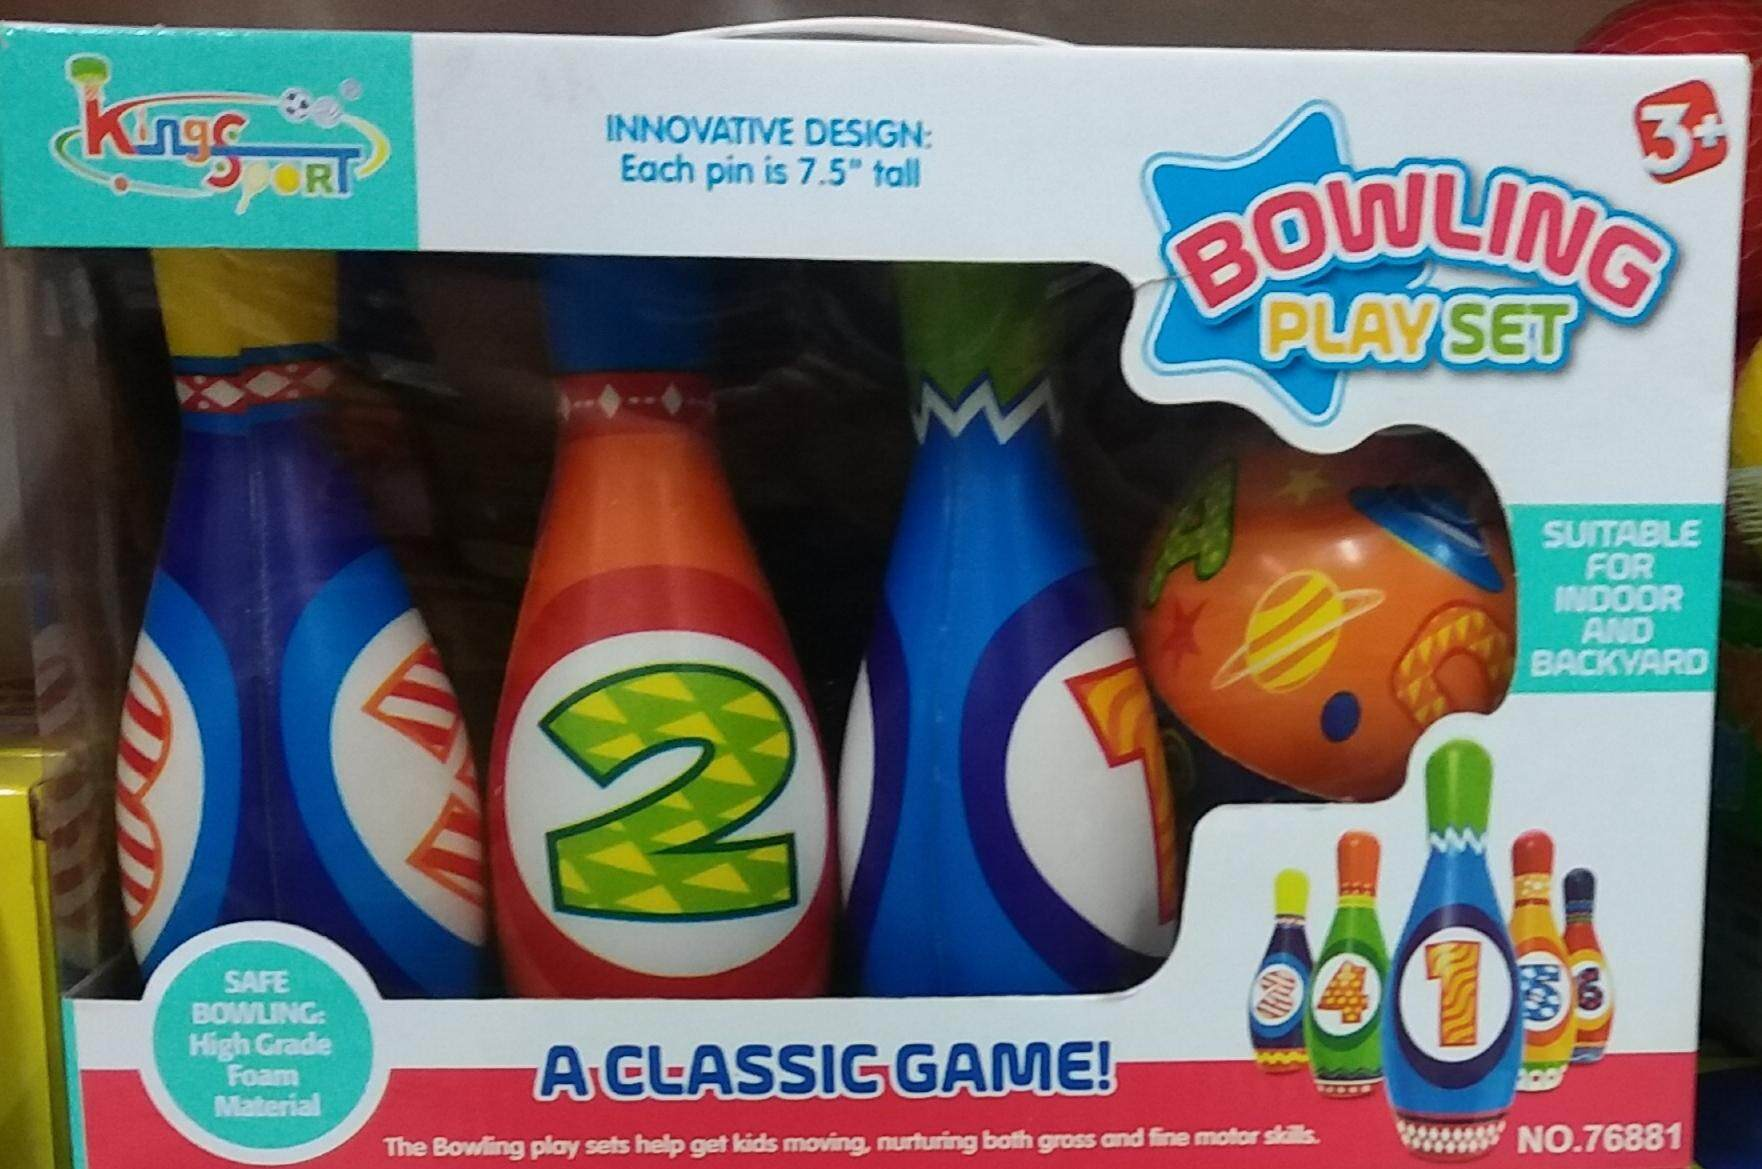 Bowling Play Set ของเล่นเด็ก 3+ ภายในกล่องมี 6 Pin 1 Ball สีสรรสดใส พกพาสะดวก ส่งฟรี By Cm Shop.